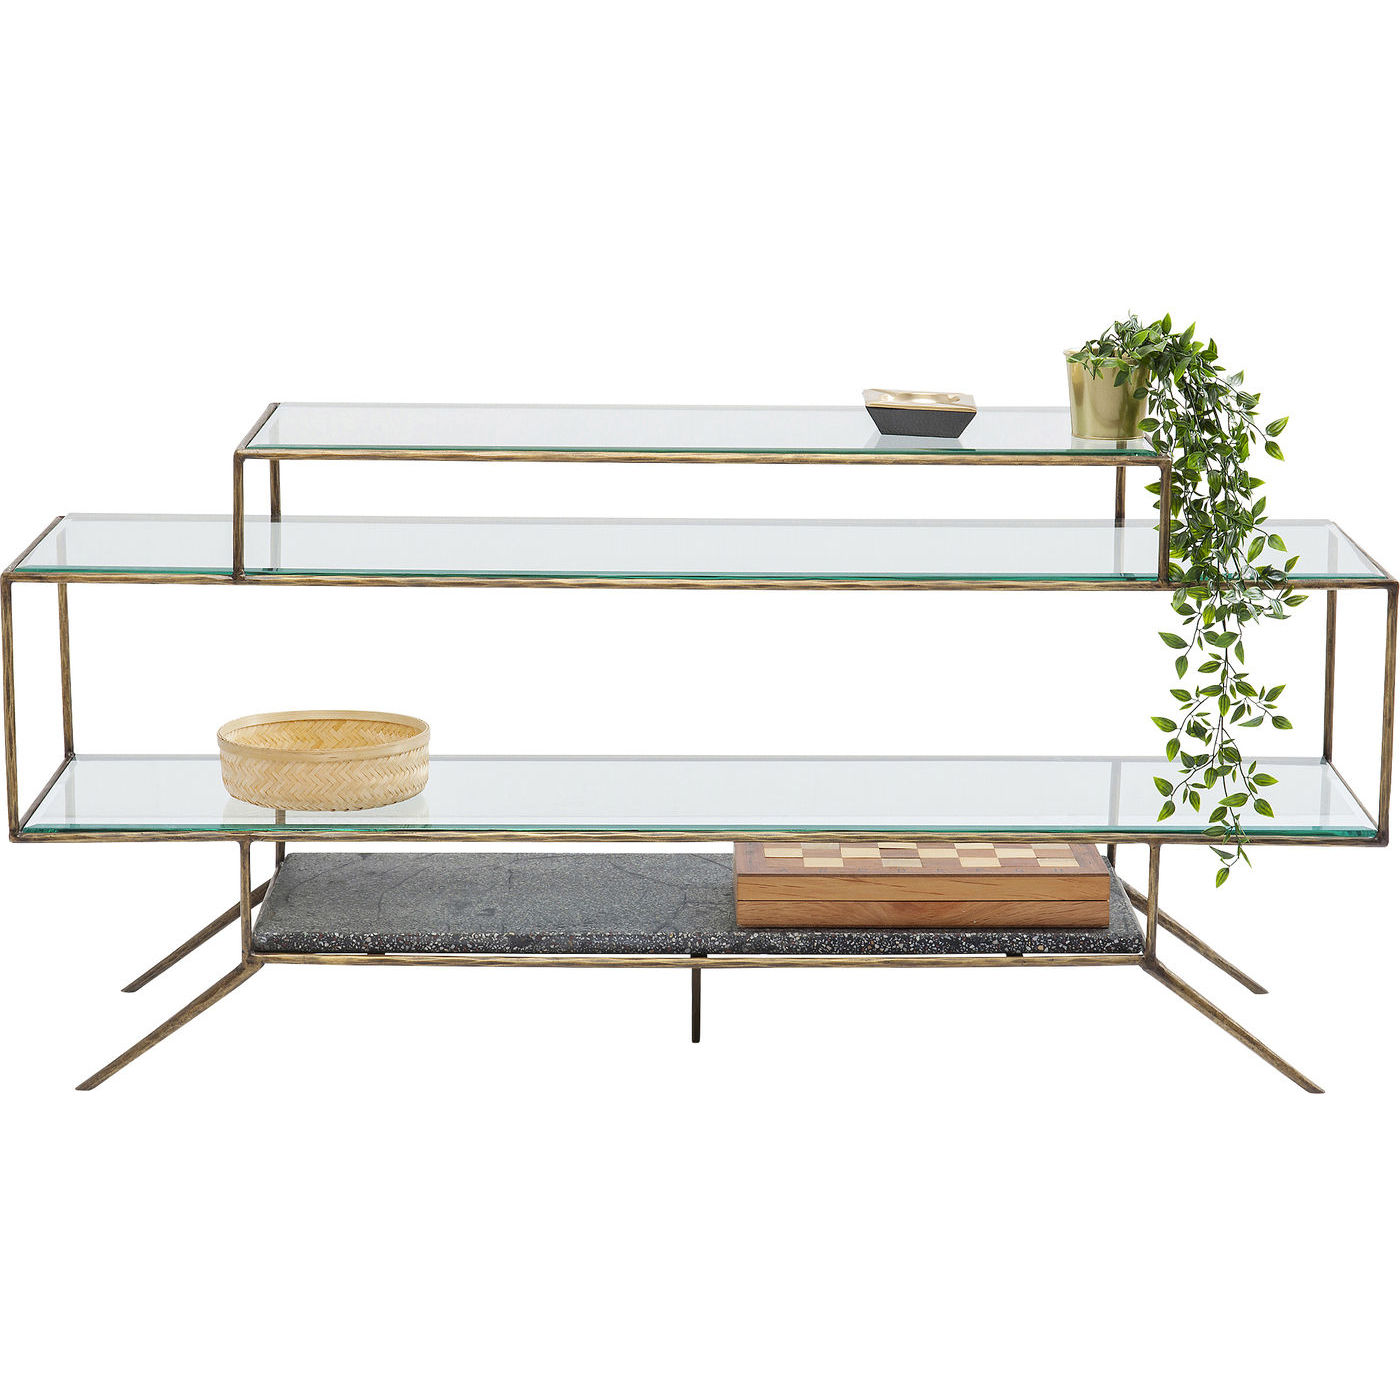 Image of   KARE DESIGN Terrazzo TV-bord - klart glas/multifarvet beton/messing stål, m. hylder